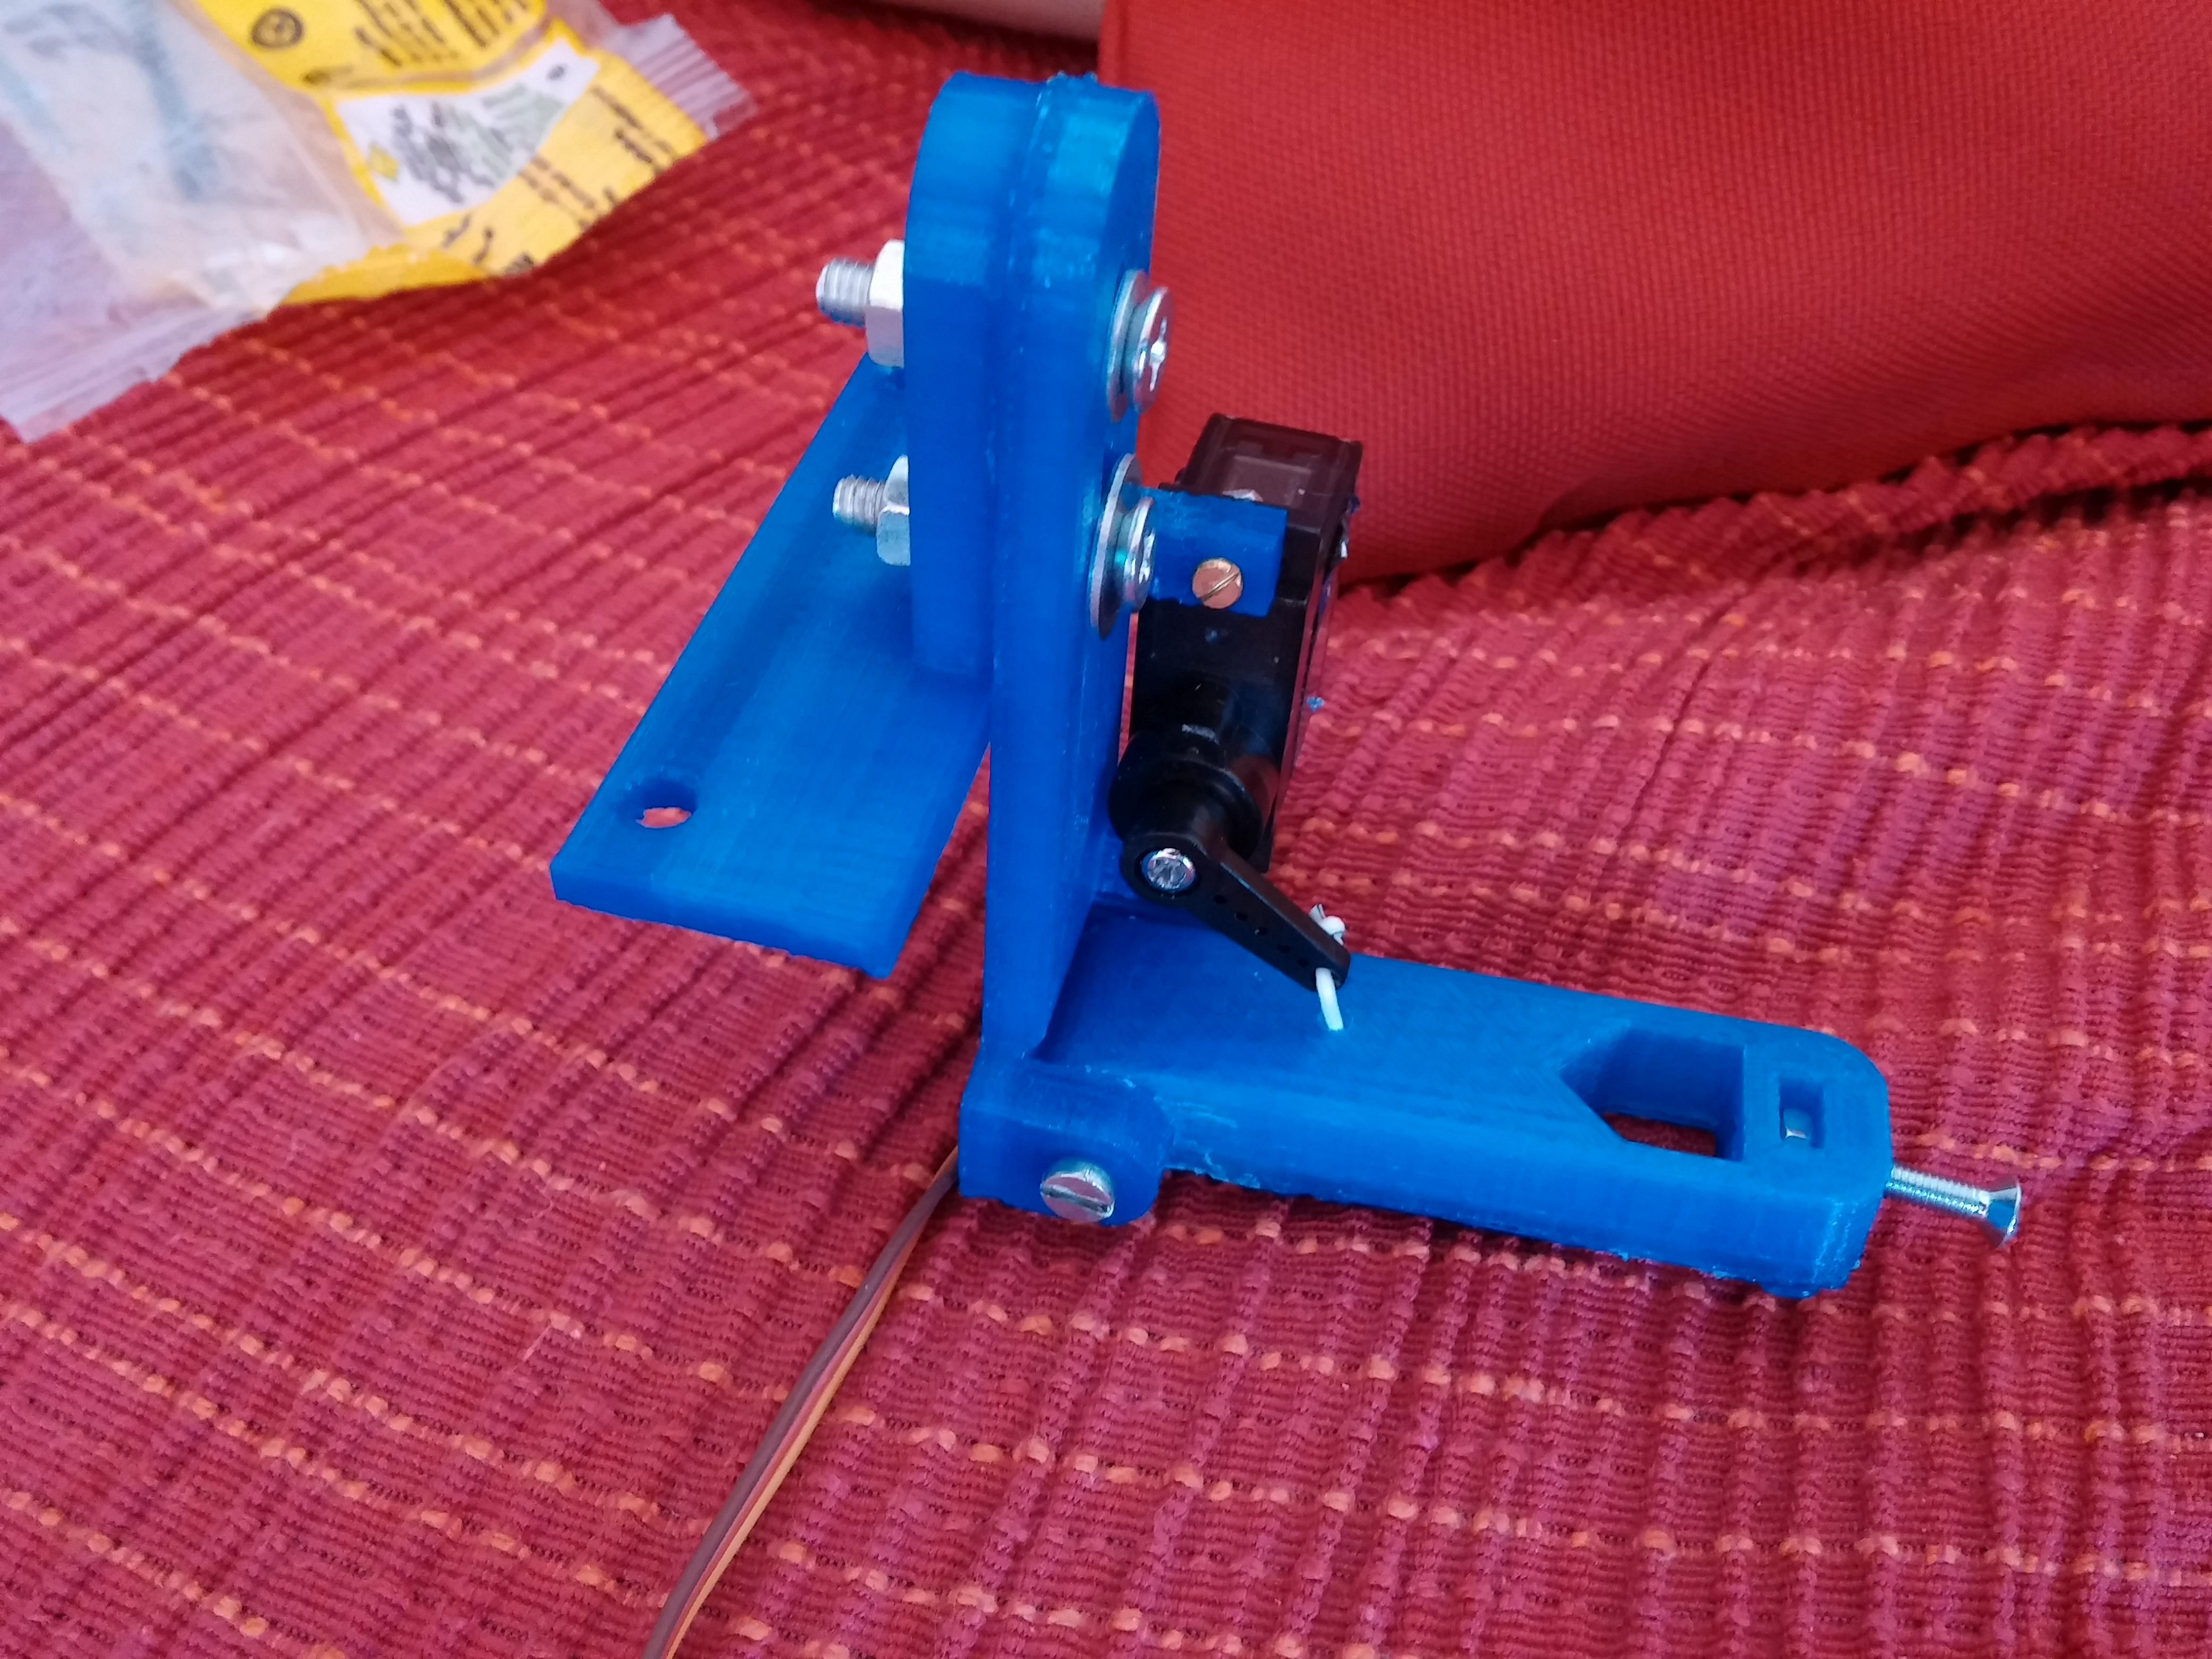 Cartesio - low cost cartesian plotter robot